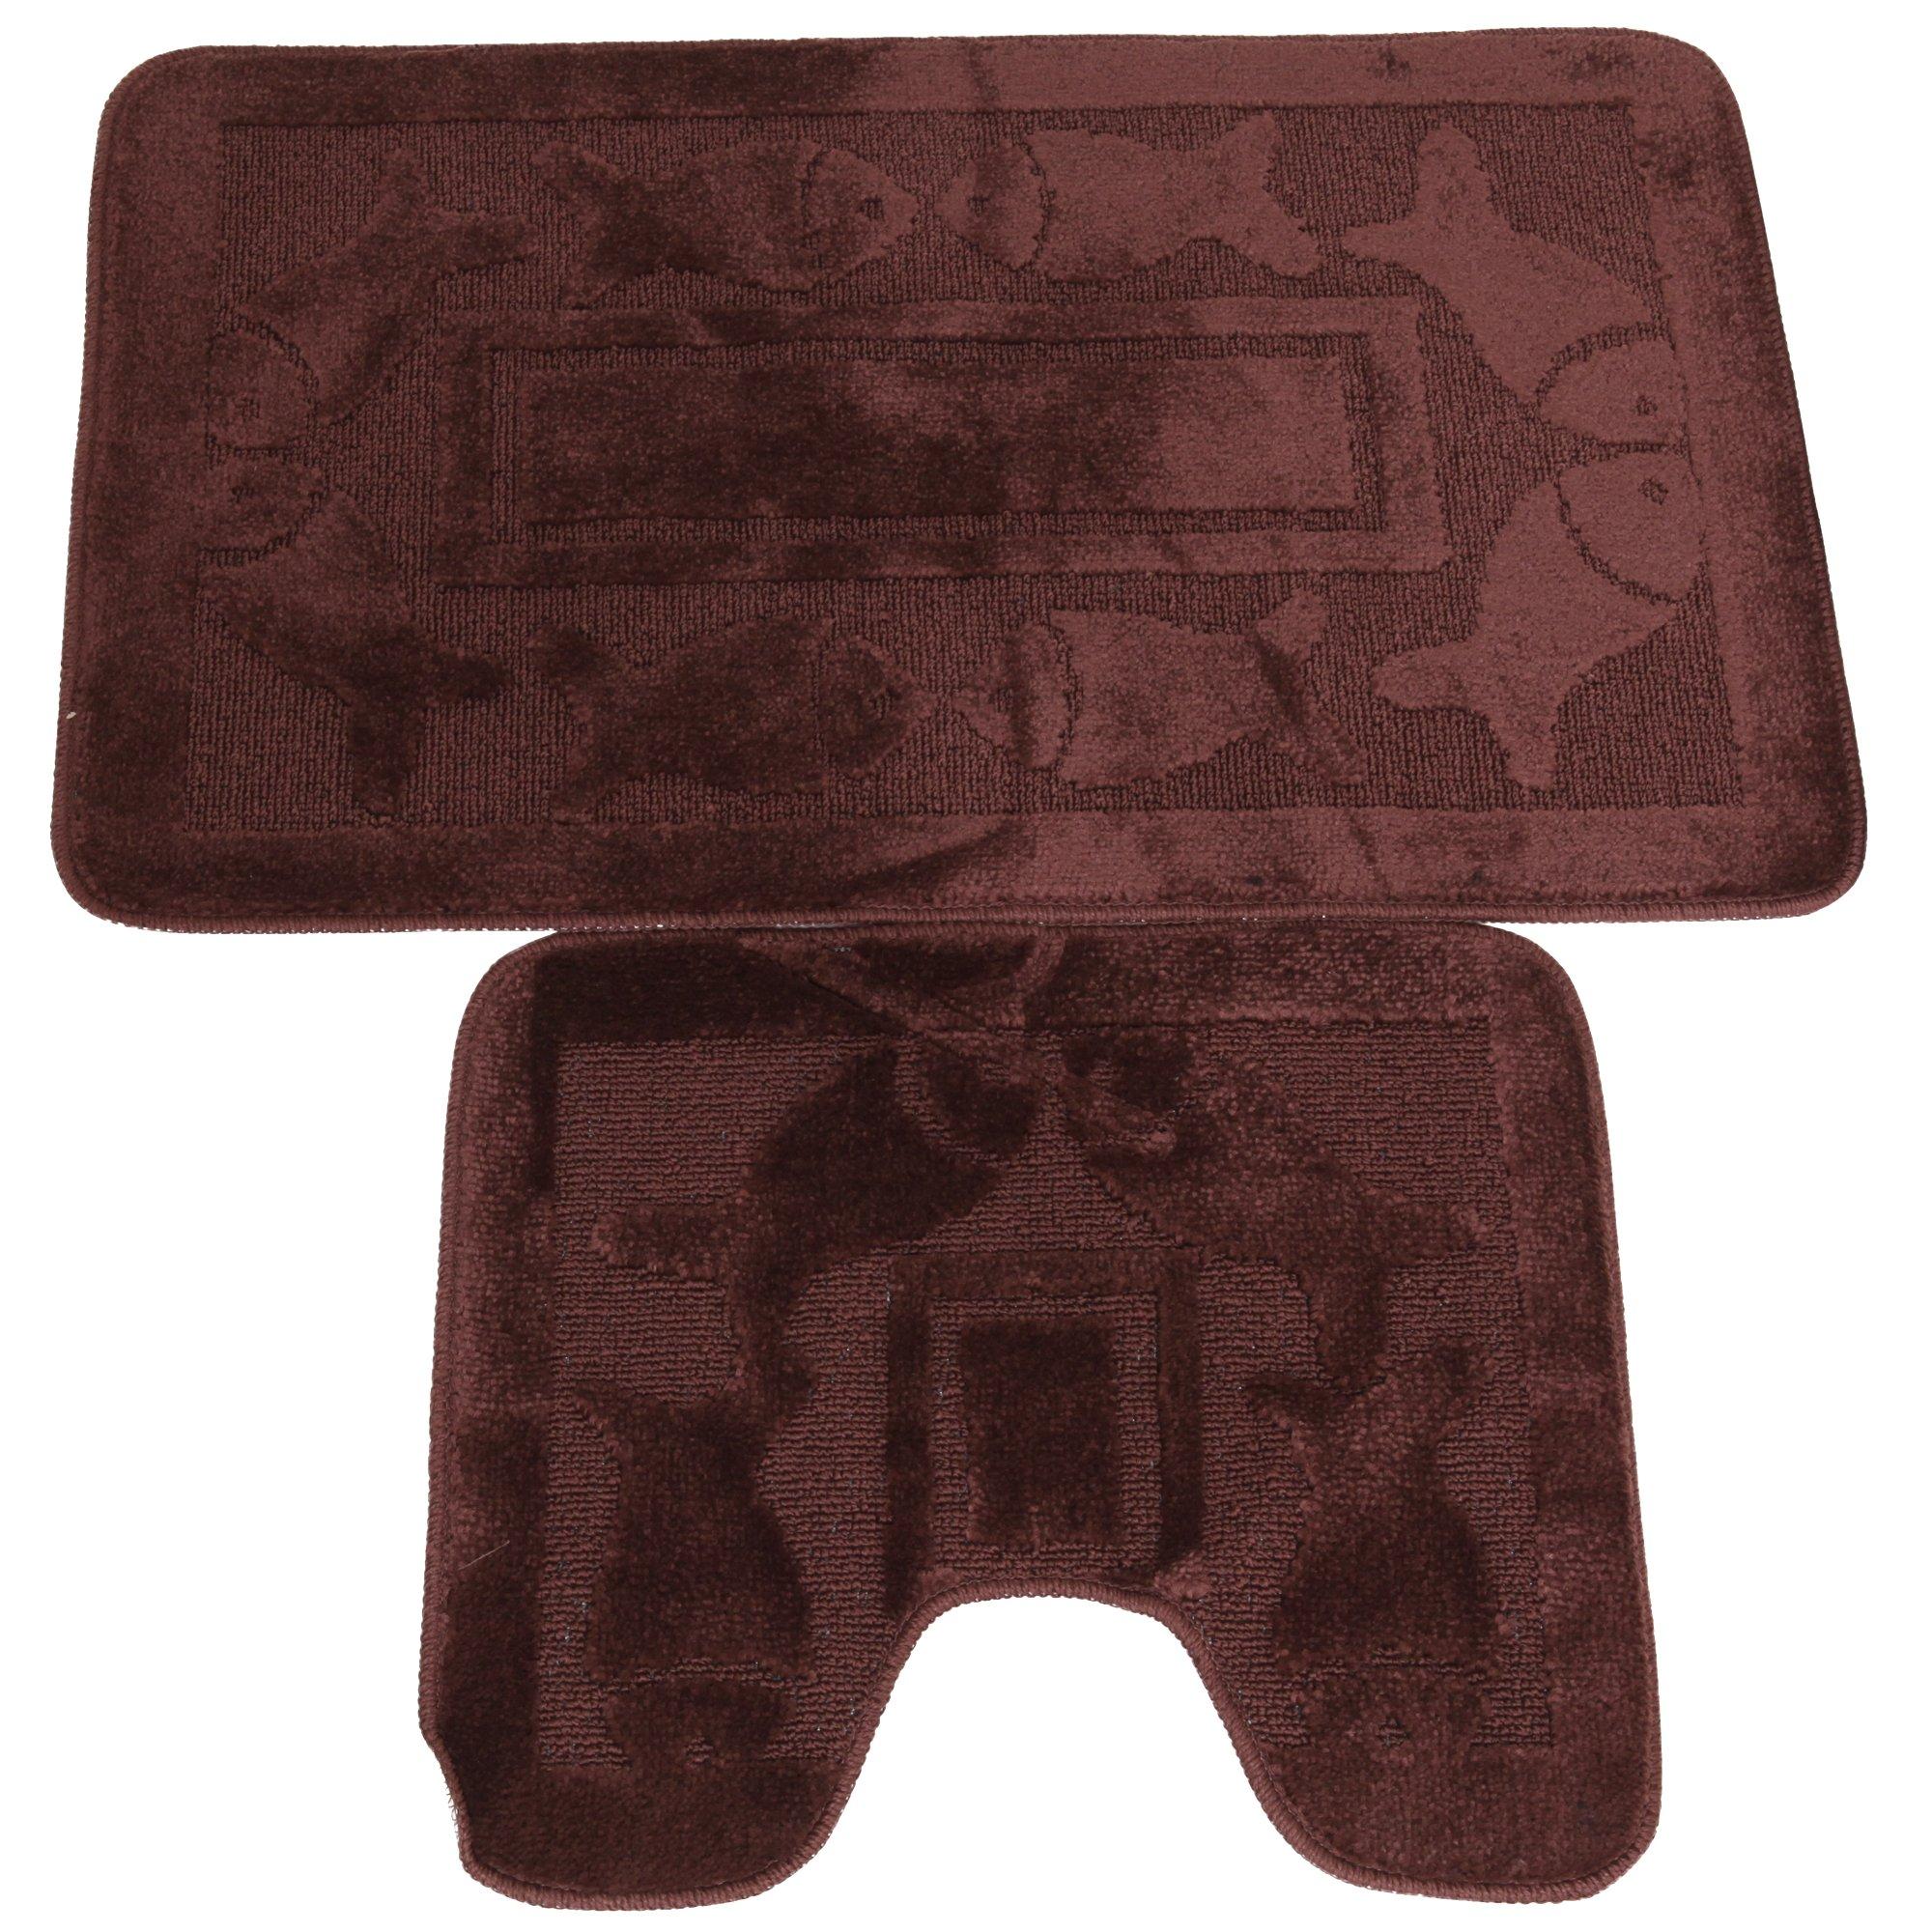 Set tappeti da bagno 2 pezzi 9 colori - Set tappeti per bagno ...